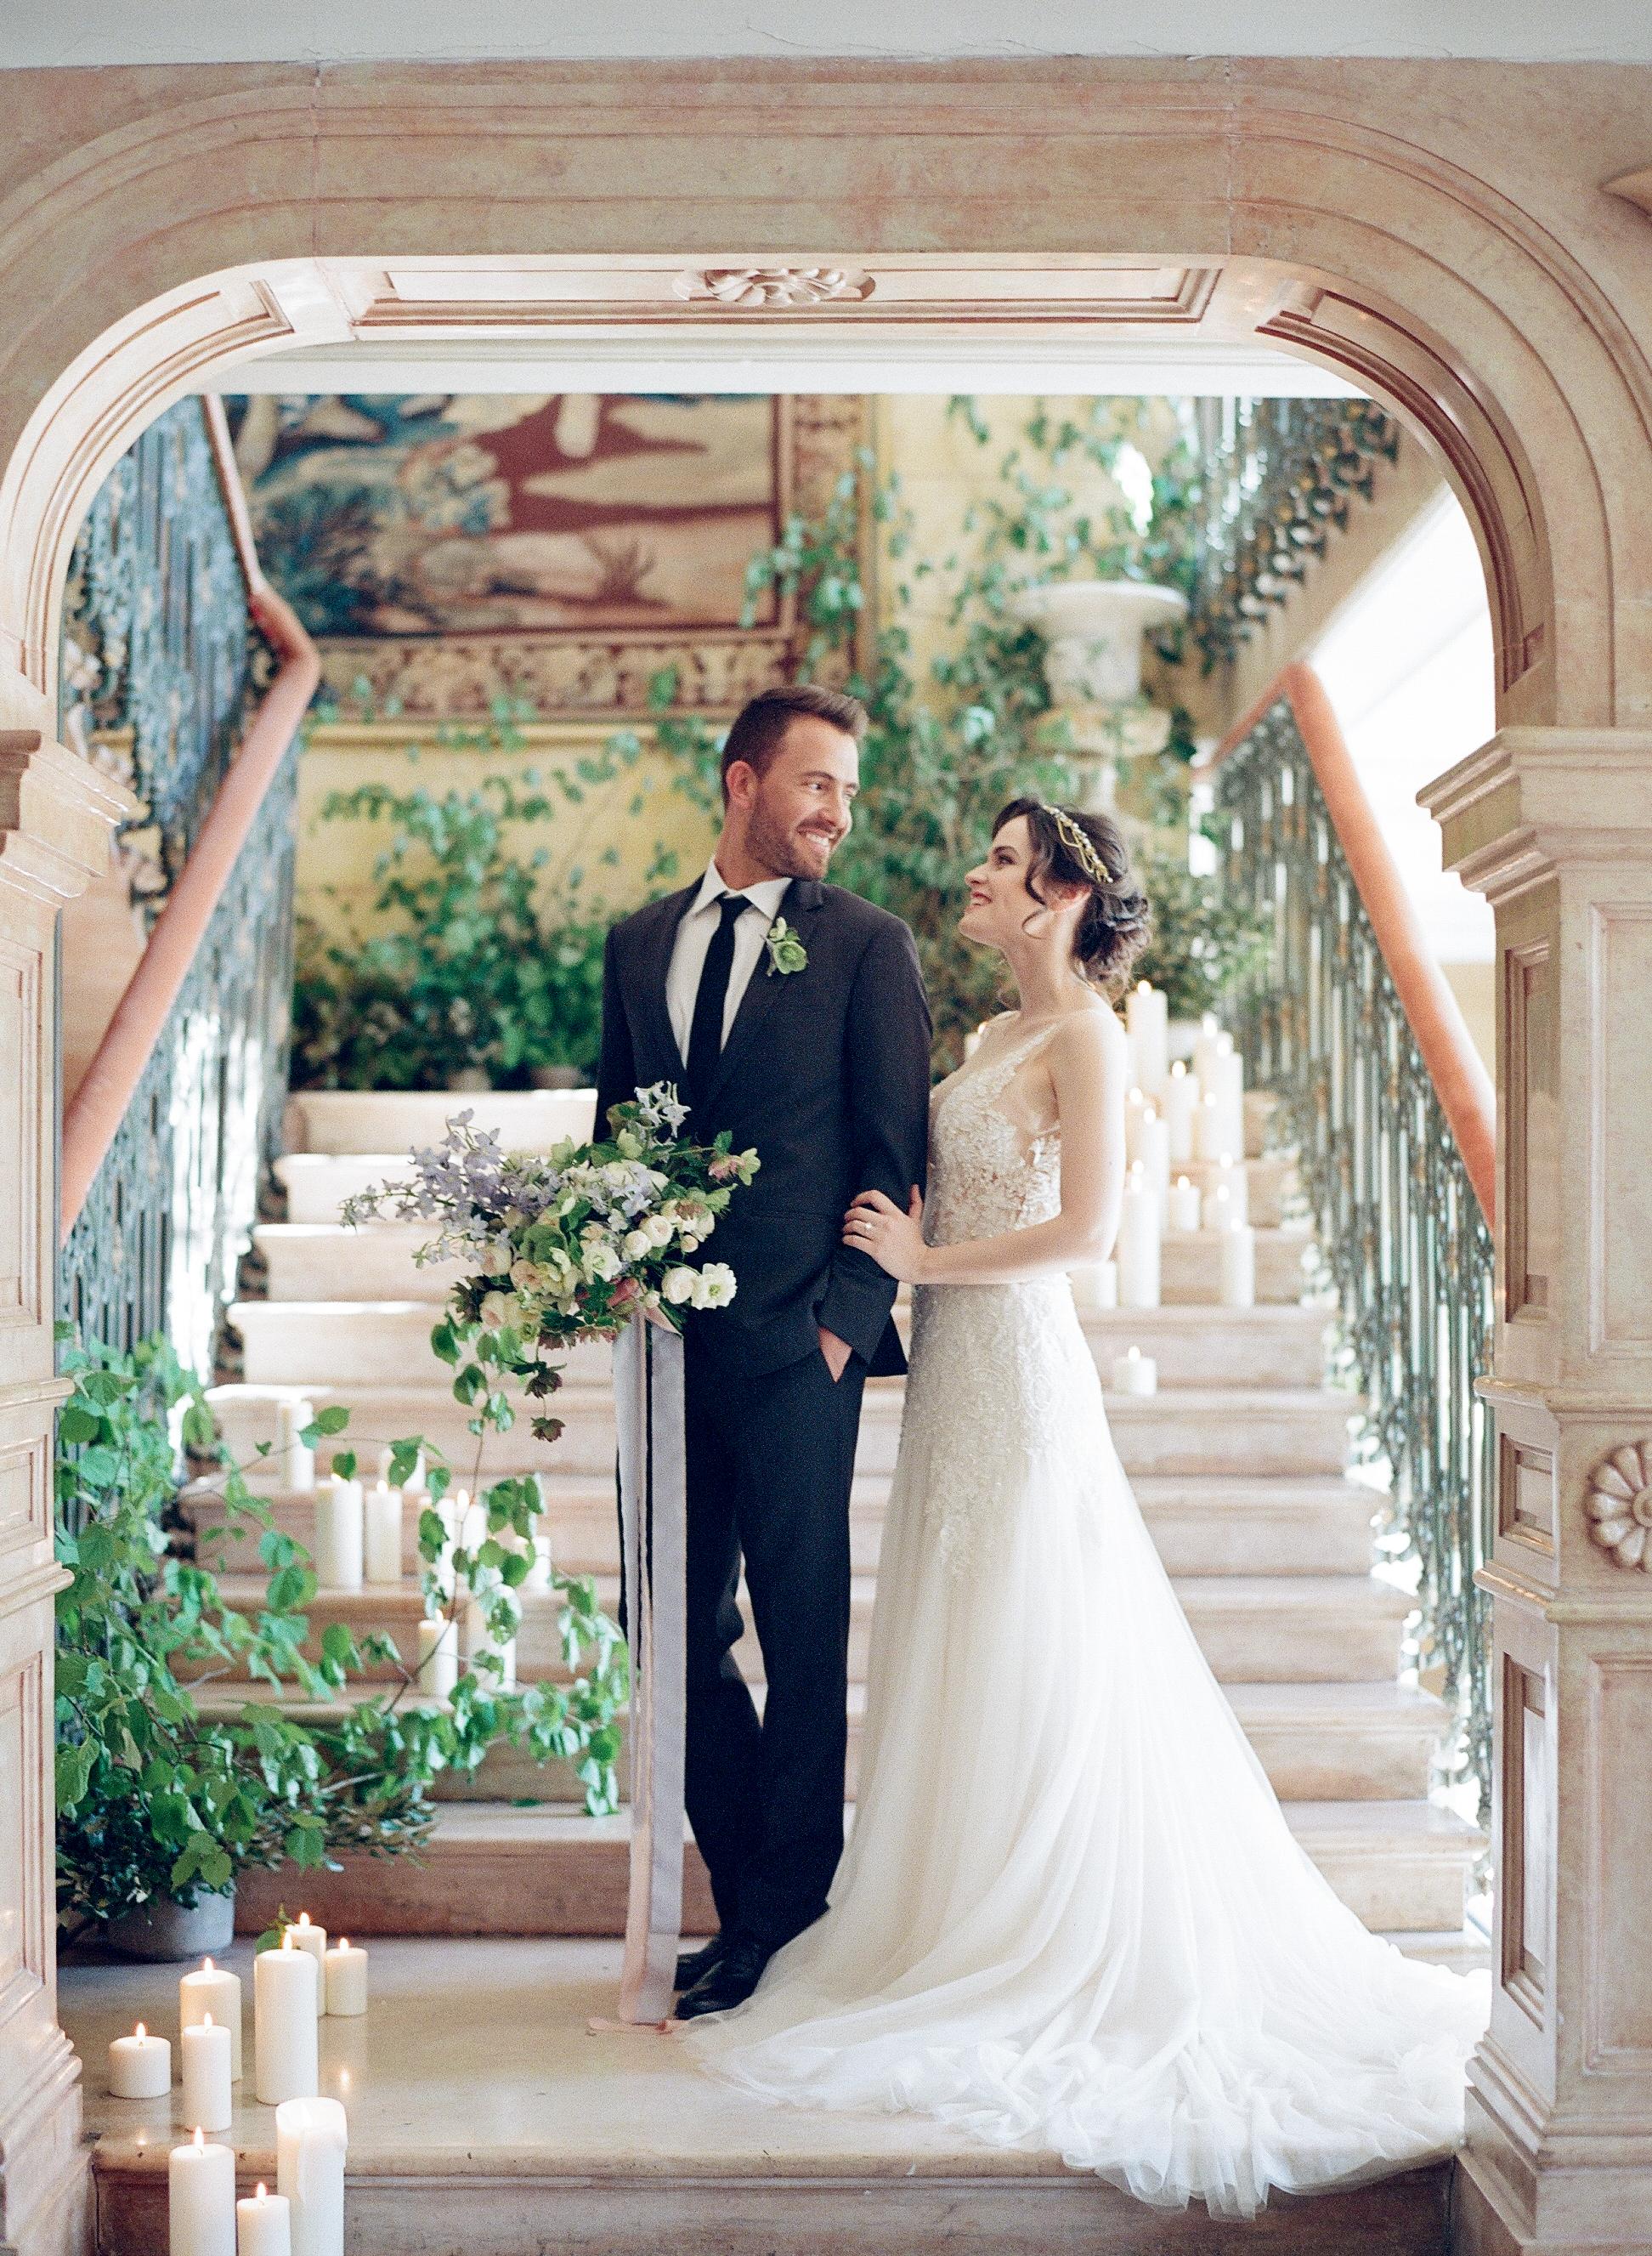 Sylvie-Gil-film-destination-wedding-photography-2017-workshop-chateau-de-varennes-masquerade-burgundy-france-bride-groom-chapel